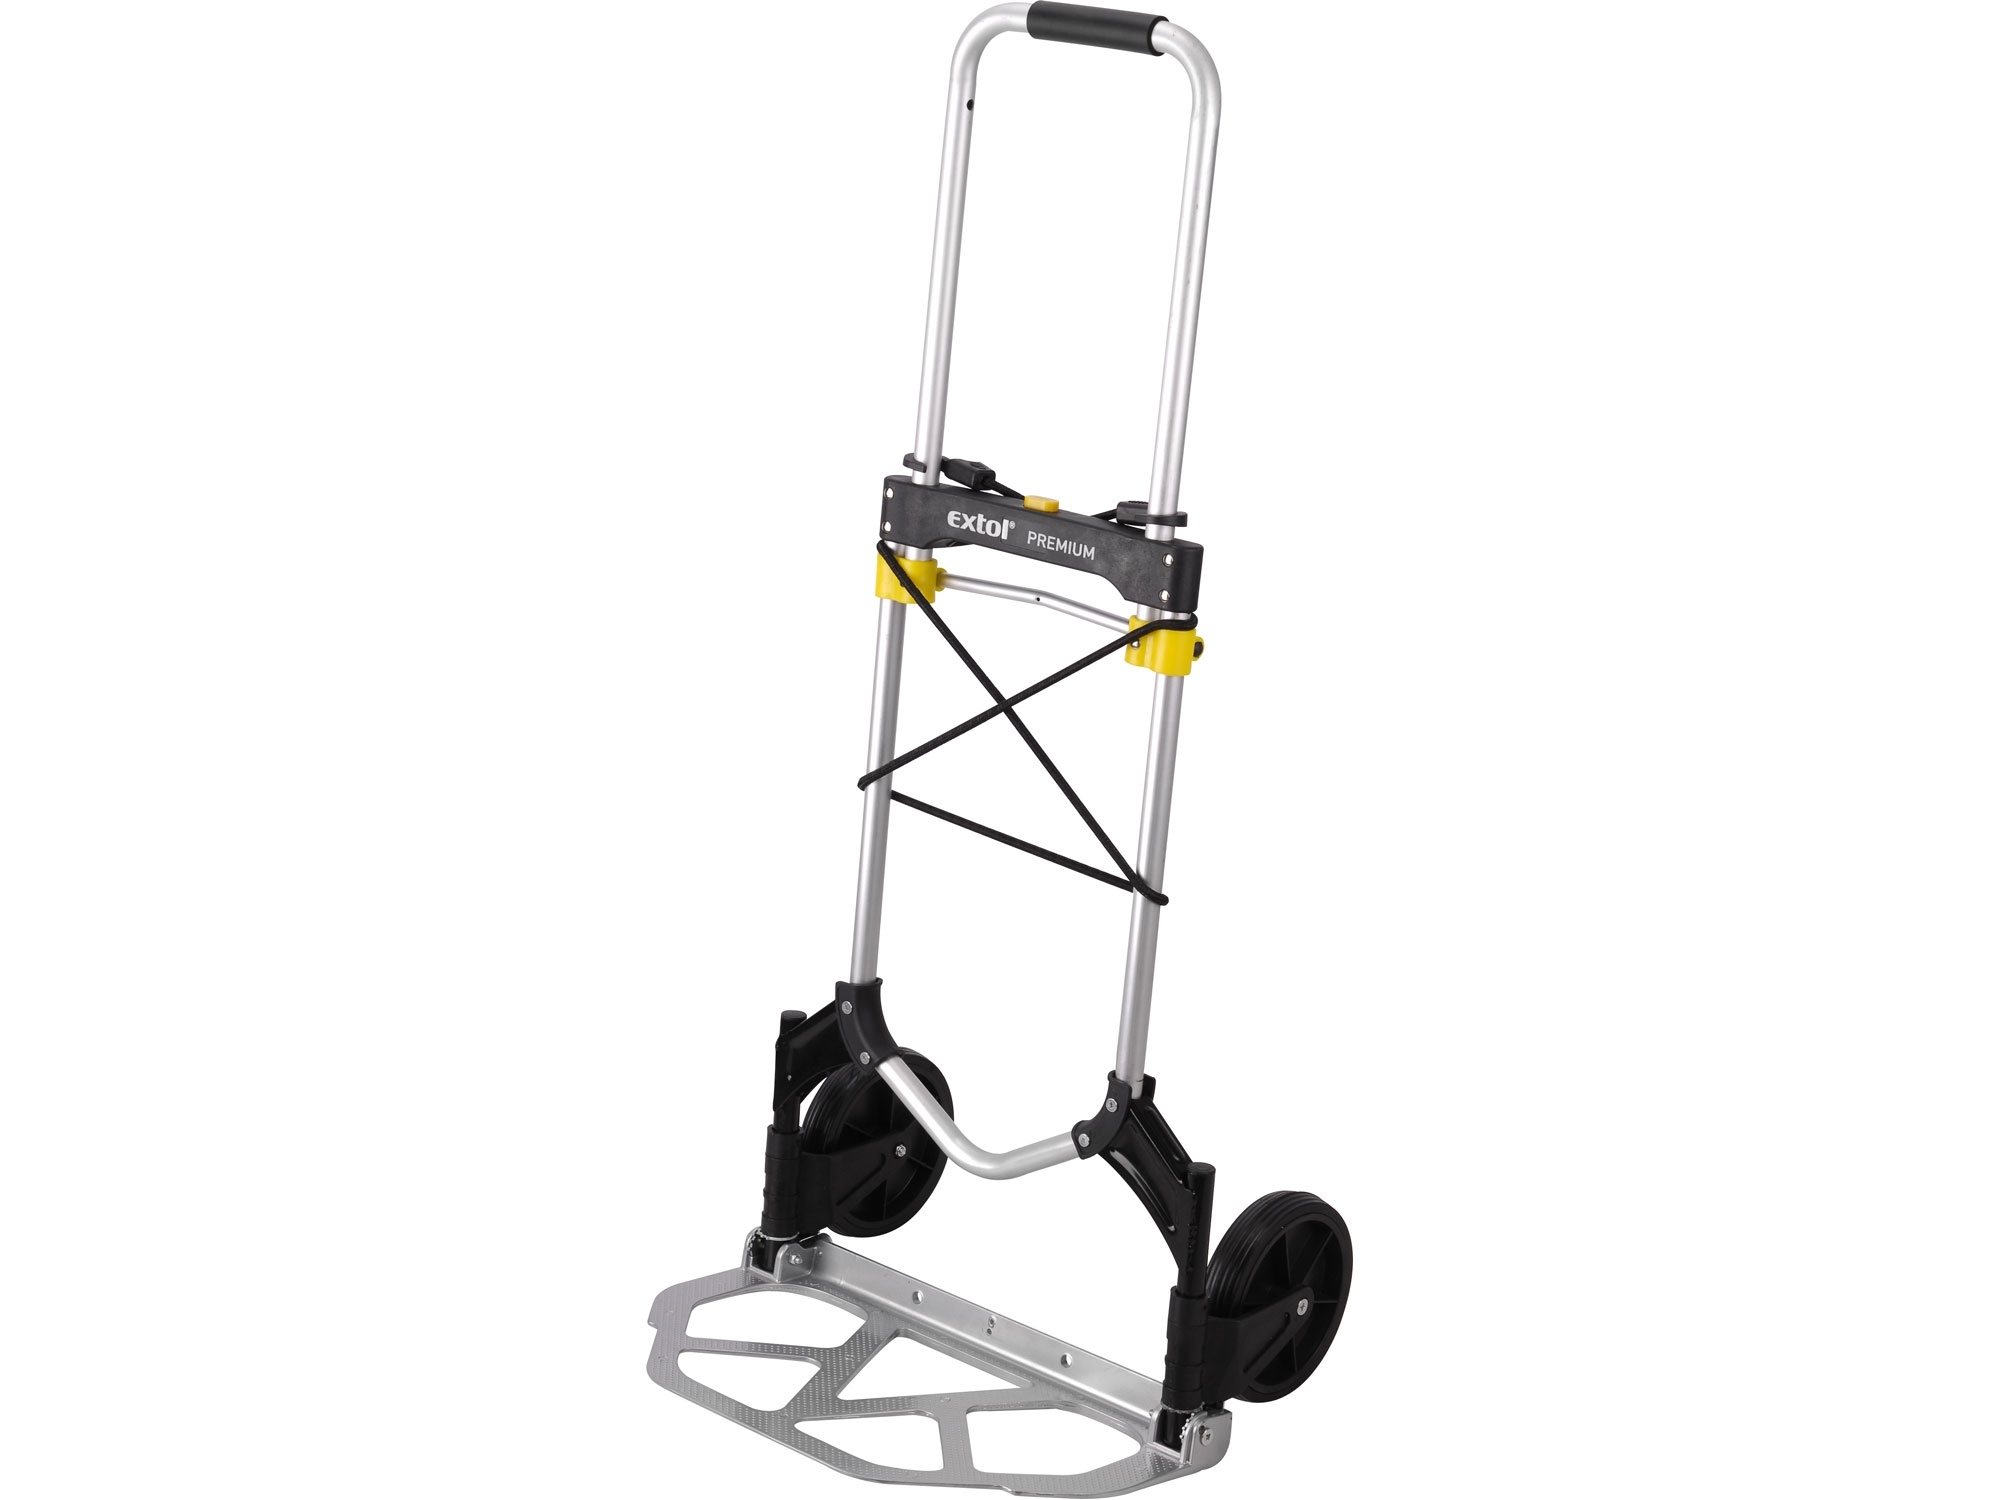 vozík-rudl skládací, EXTOL PREMIUM 8856000